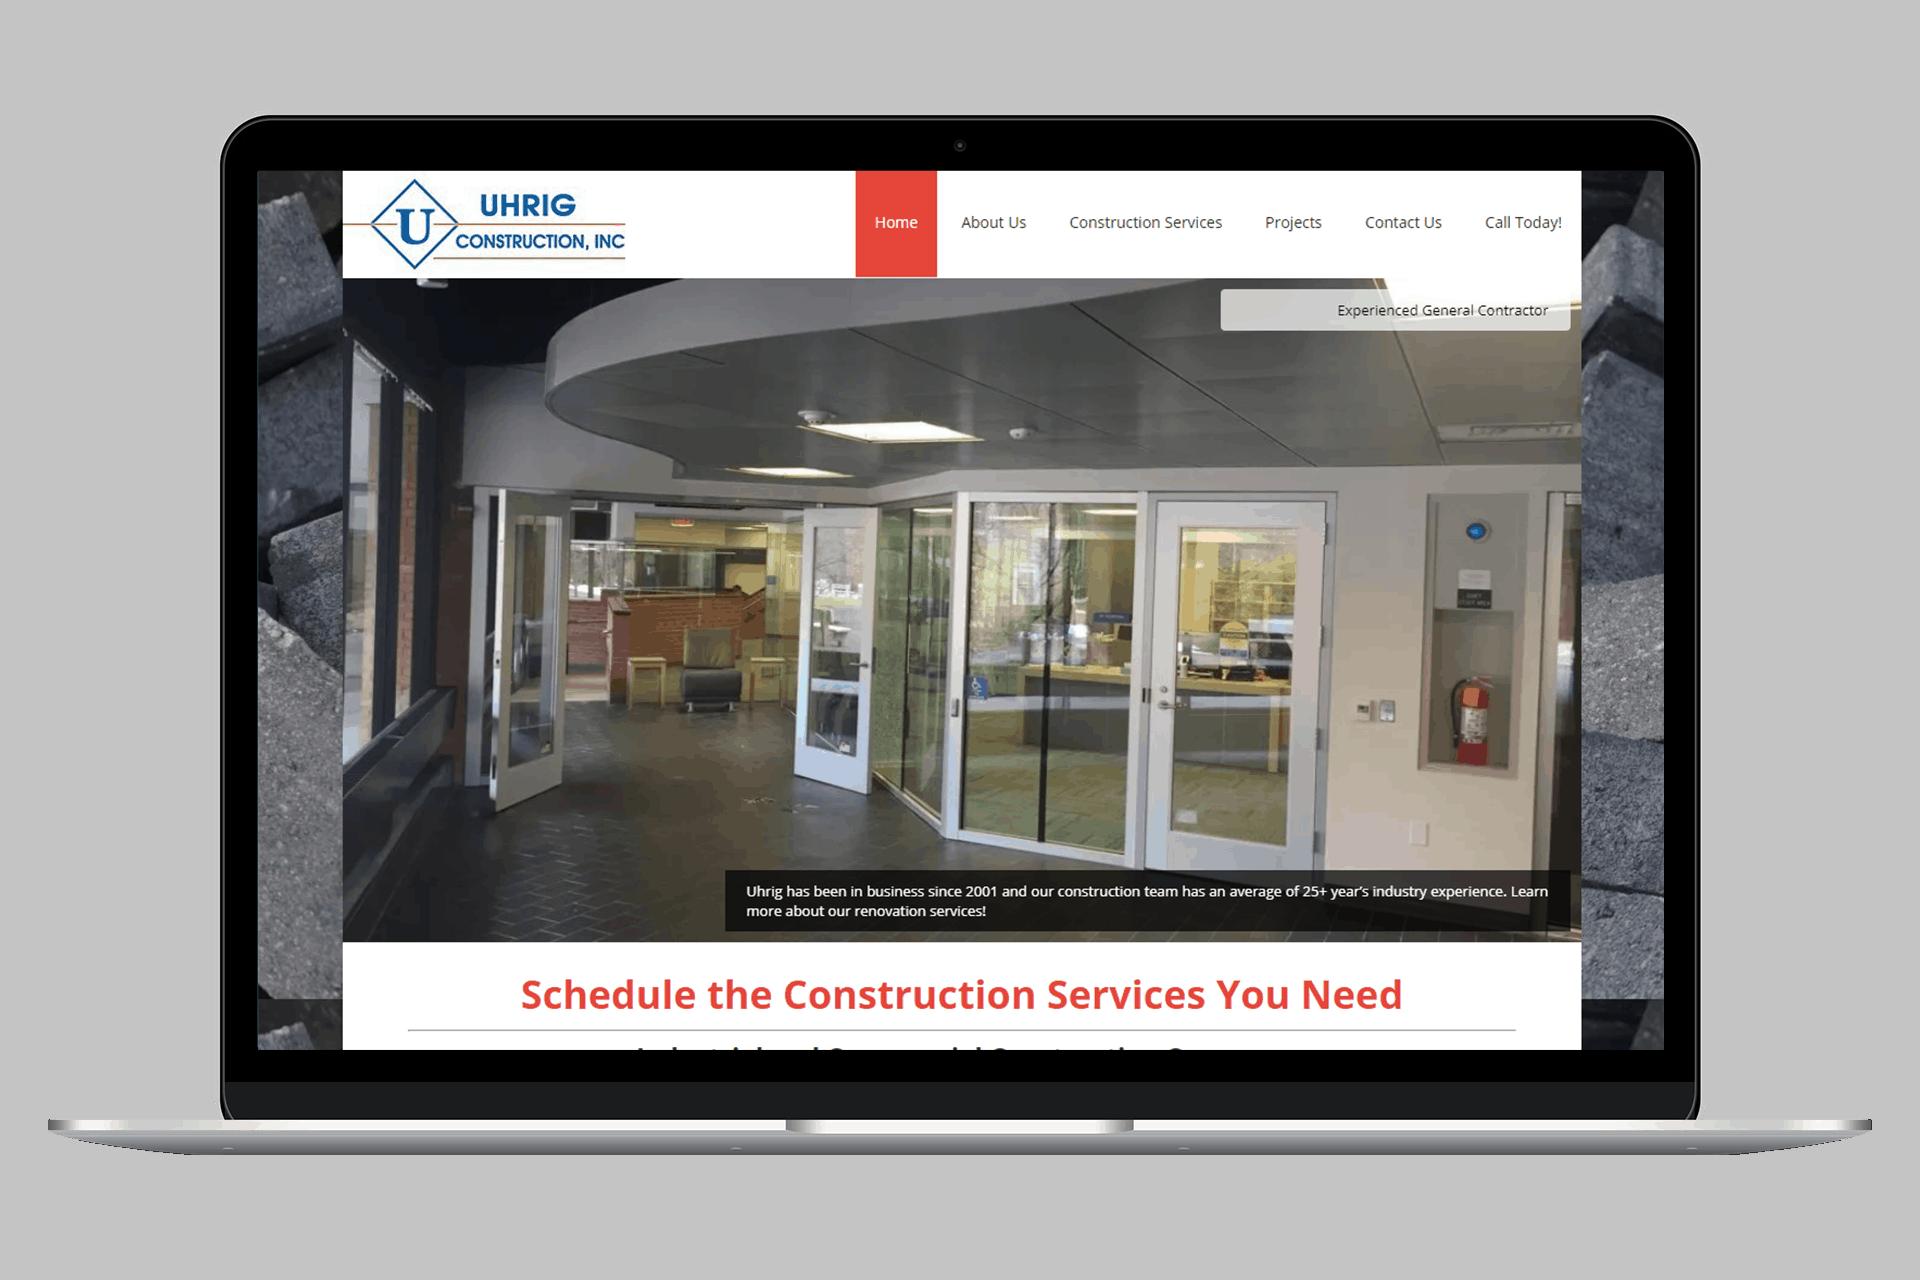 Uhrig Construction, Inc.